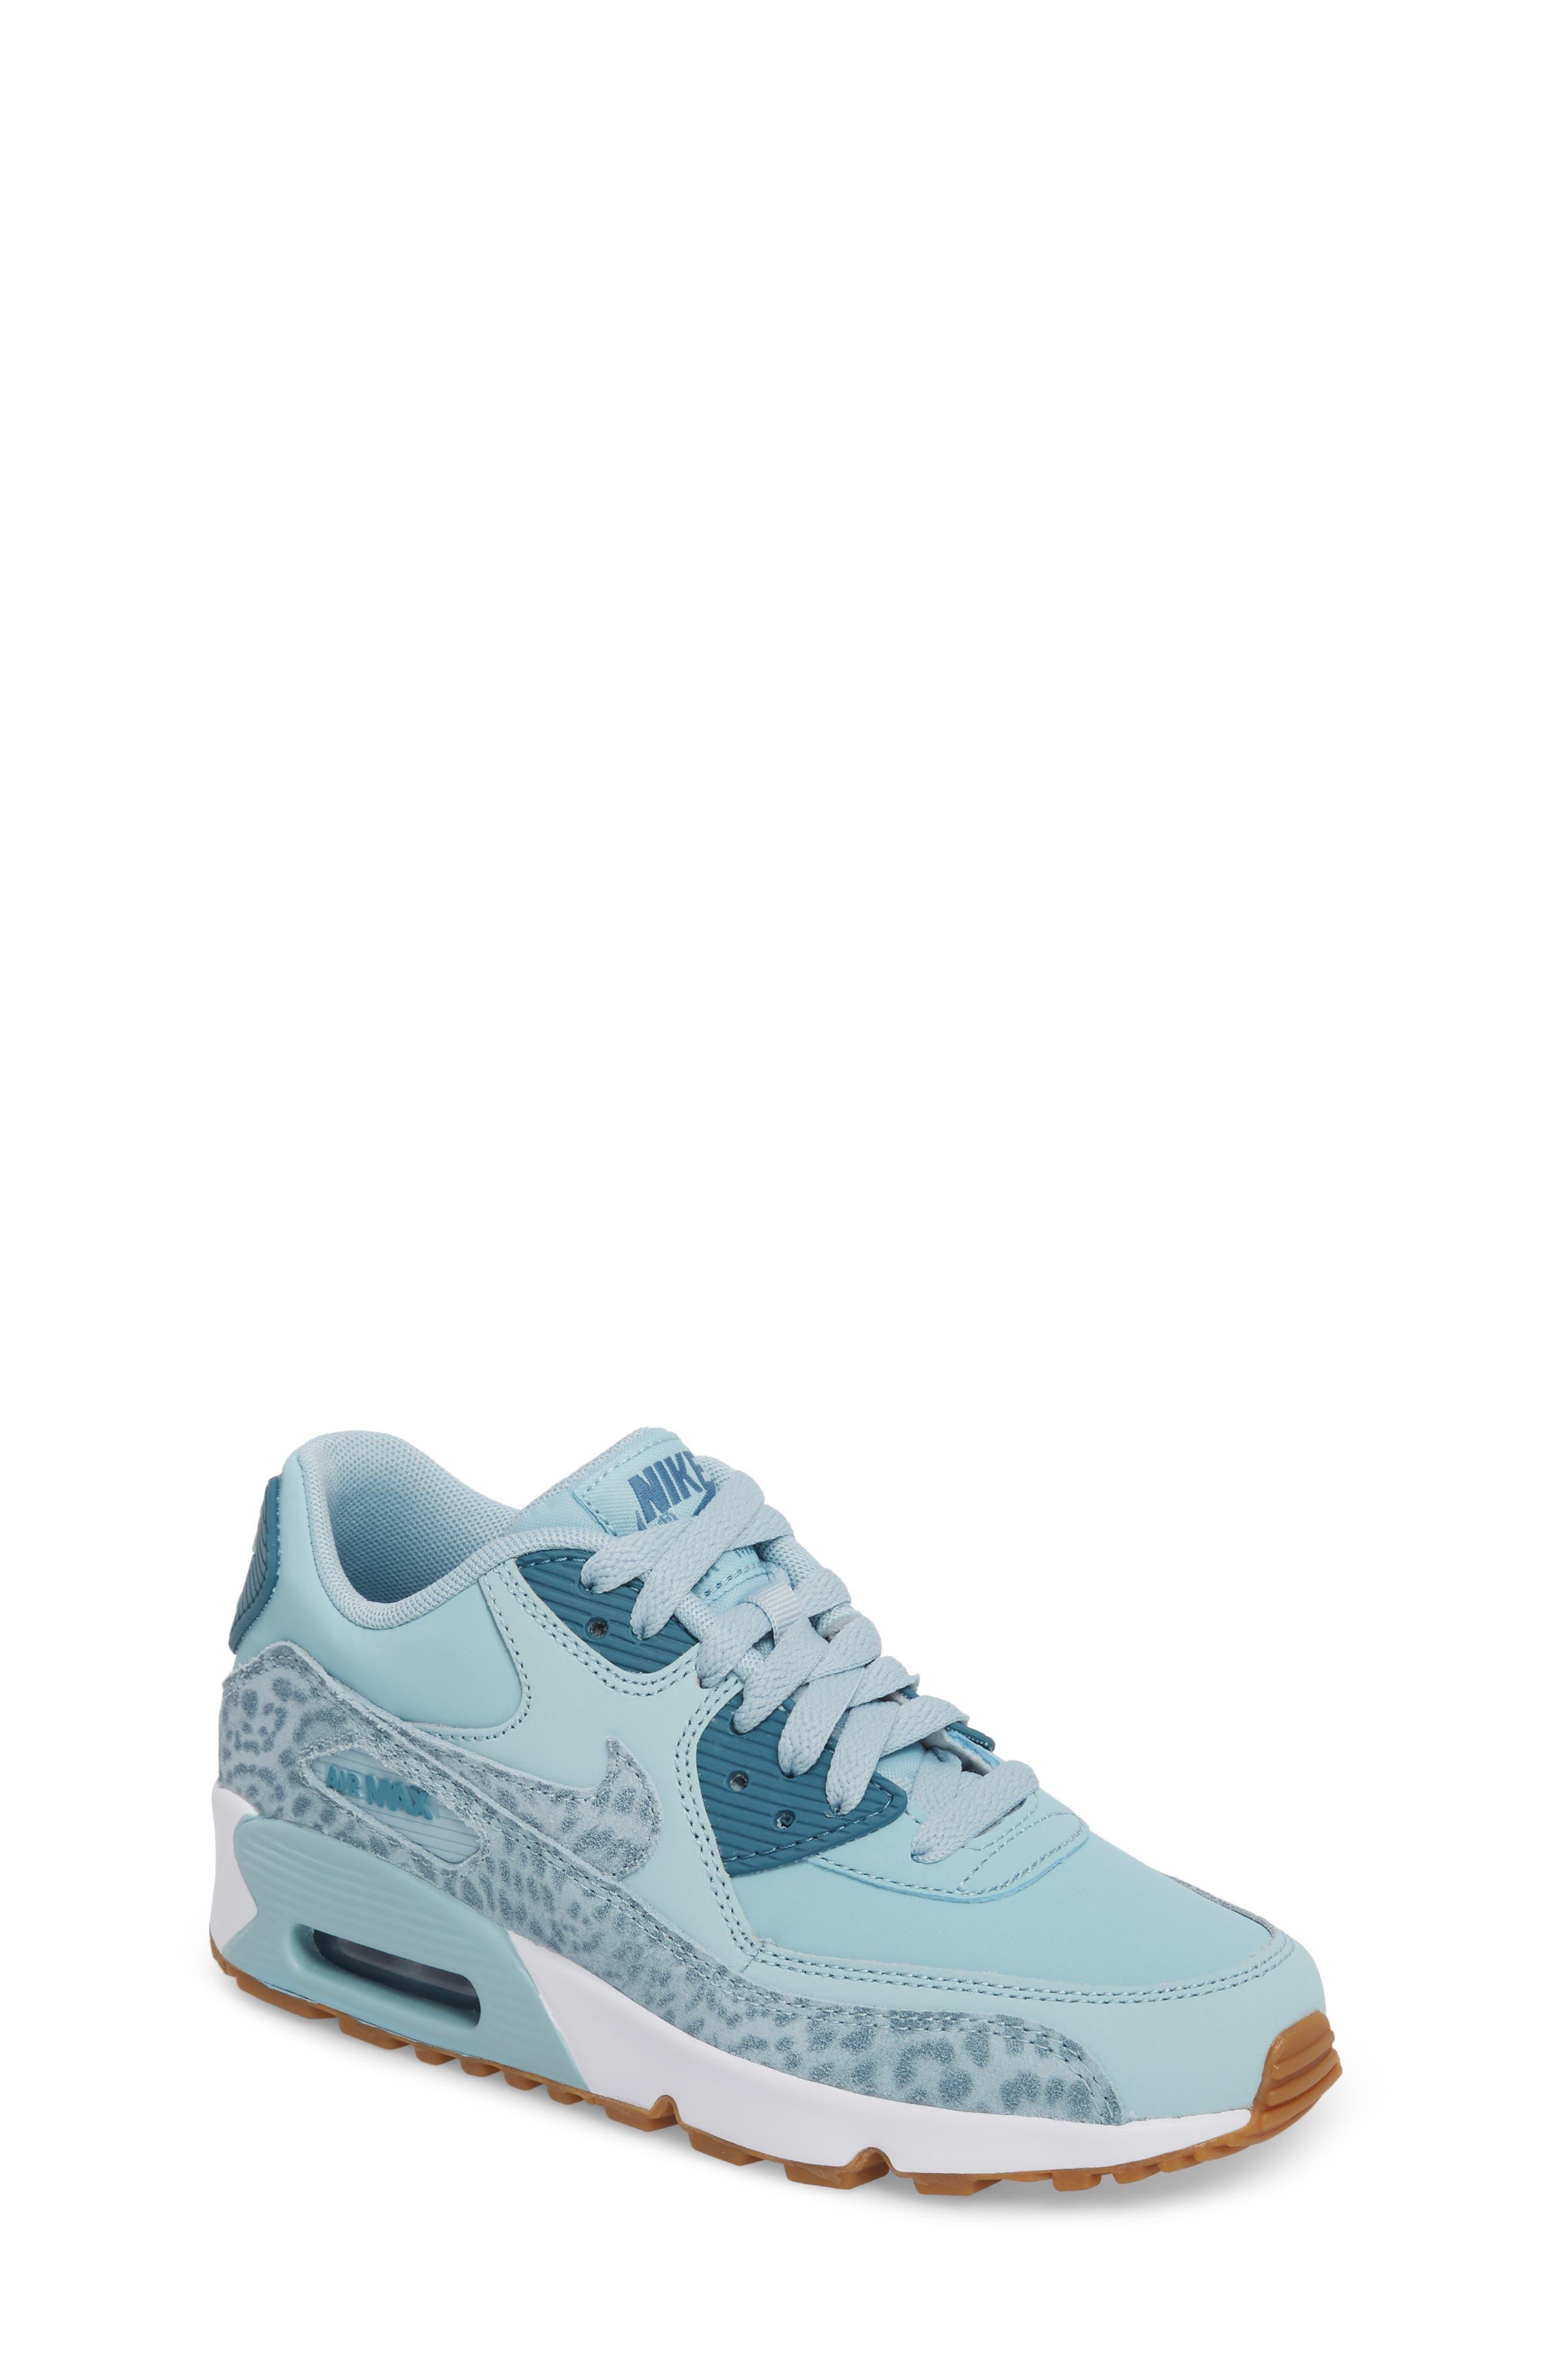 Air Max 90 Leather Sneaker,                         Main,                         color, Ocean Bliss/ Noise Aqua/ White